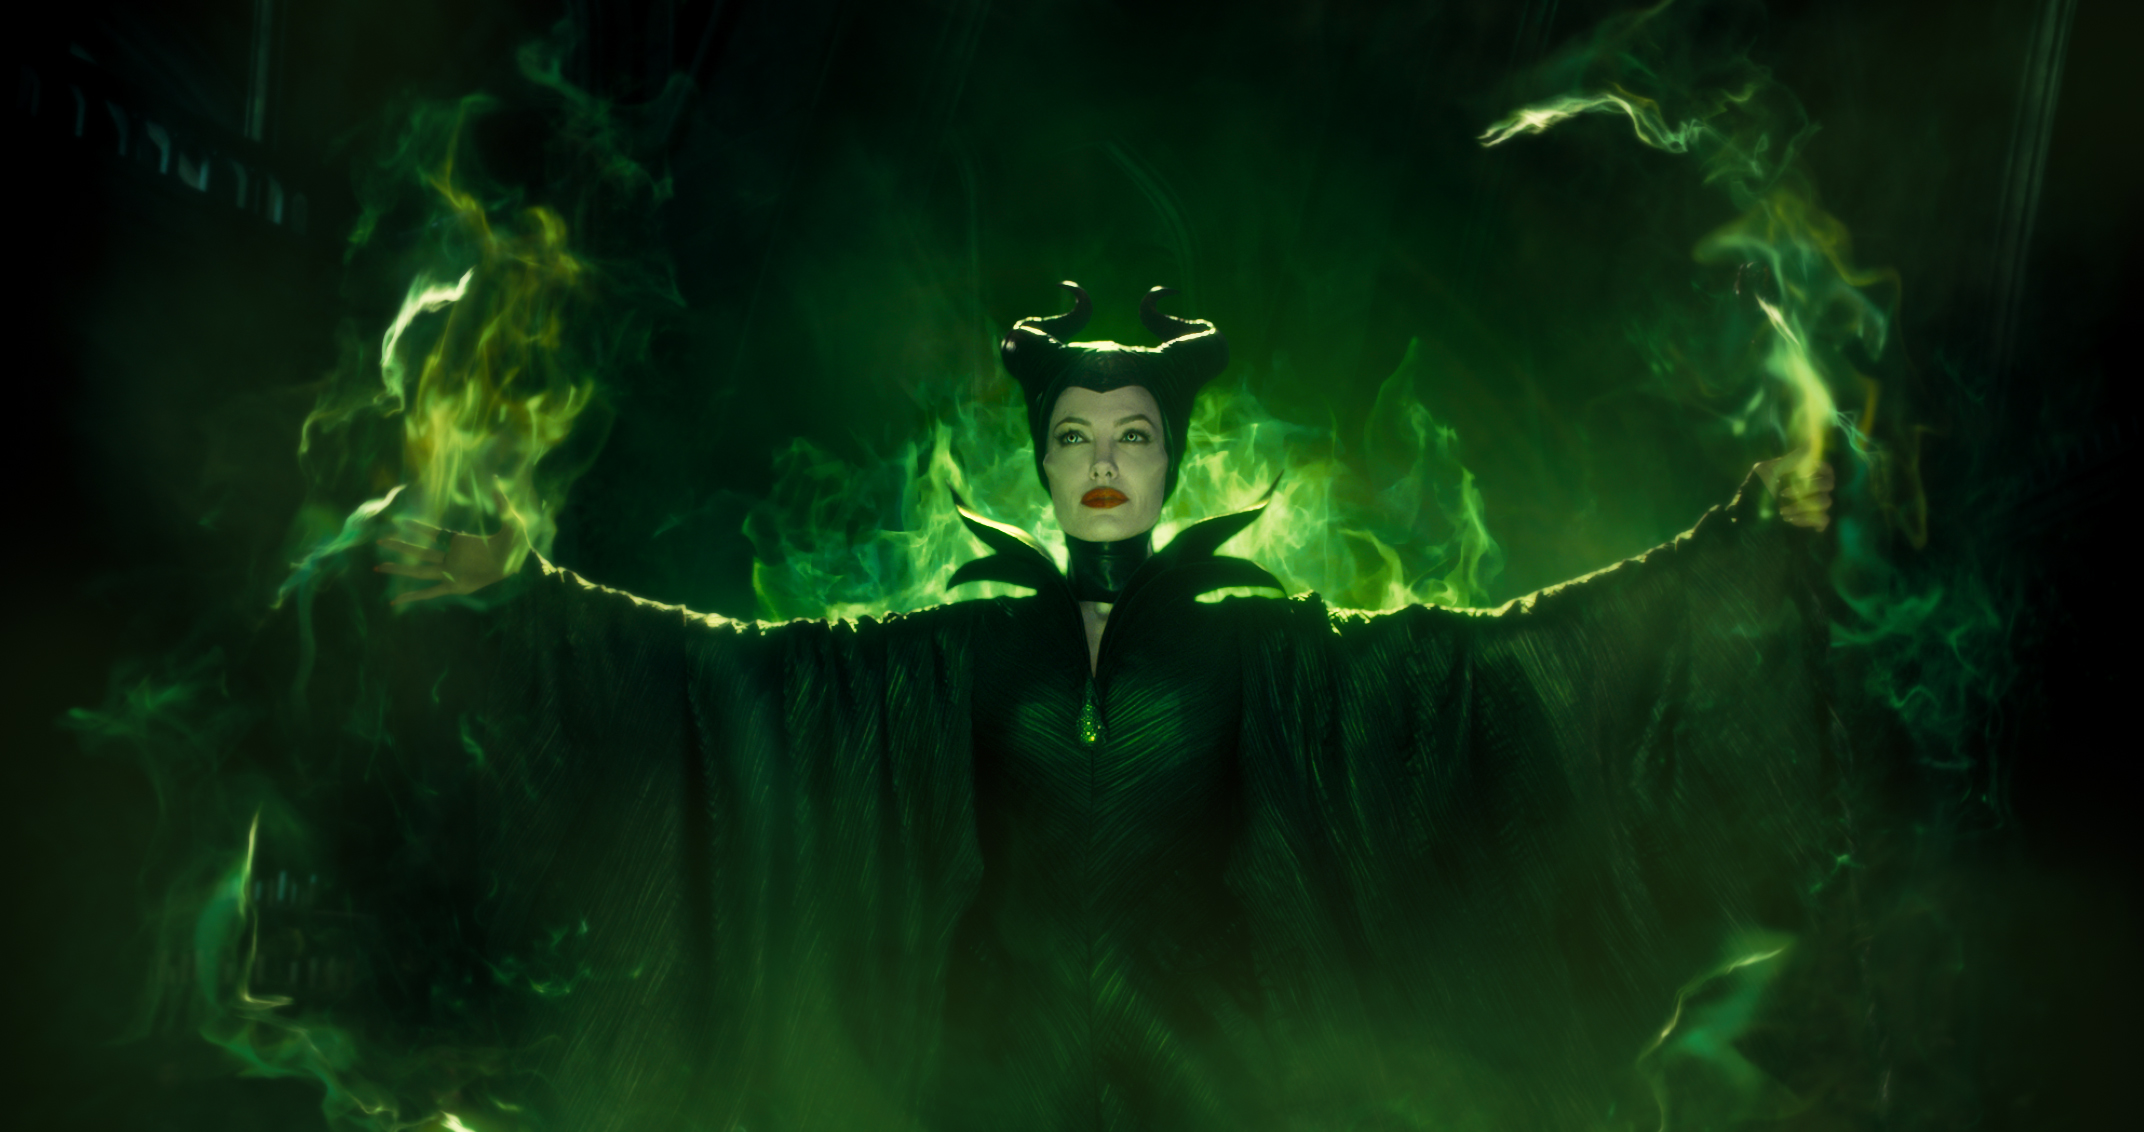 maleficent-green